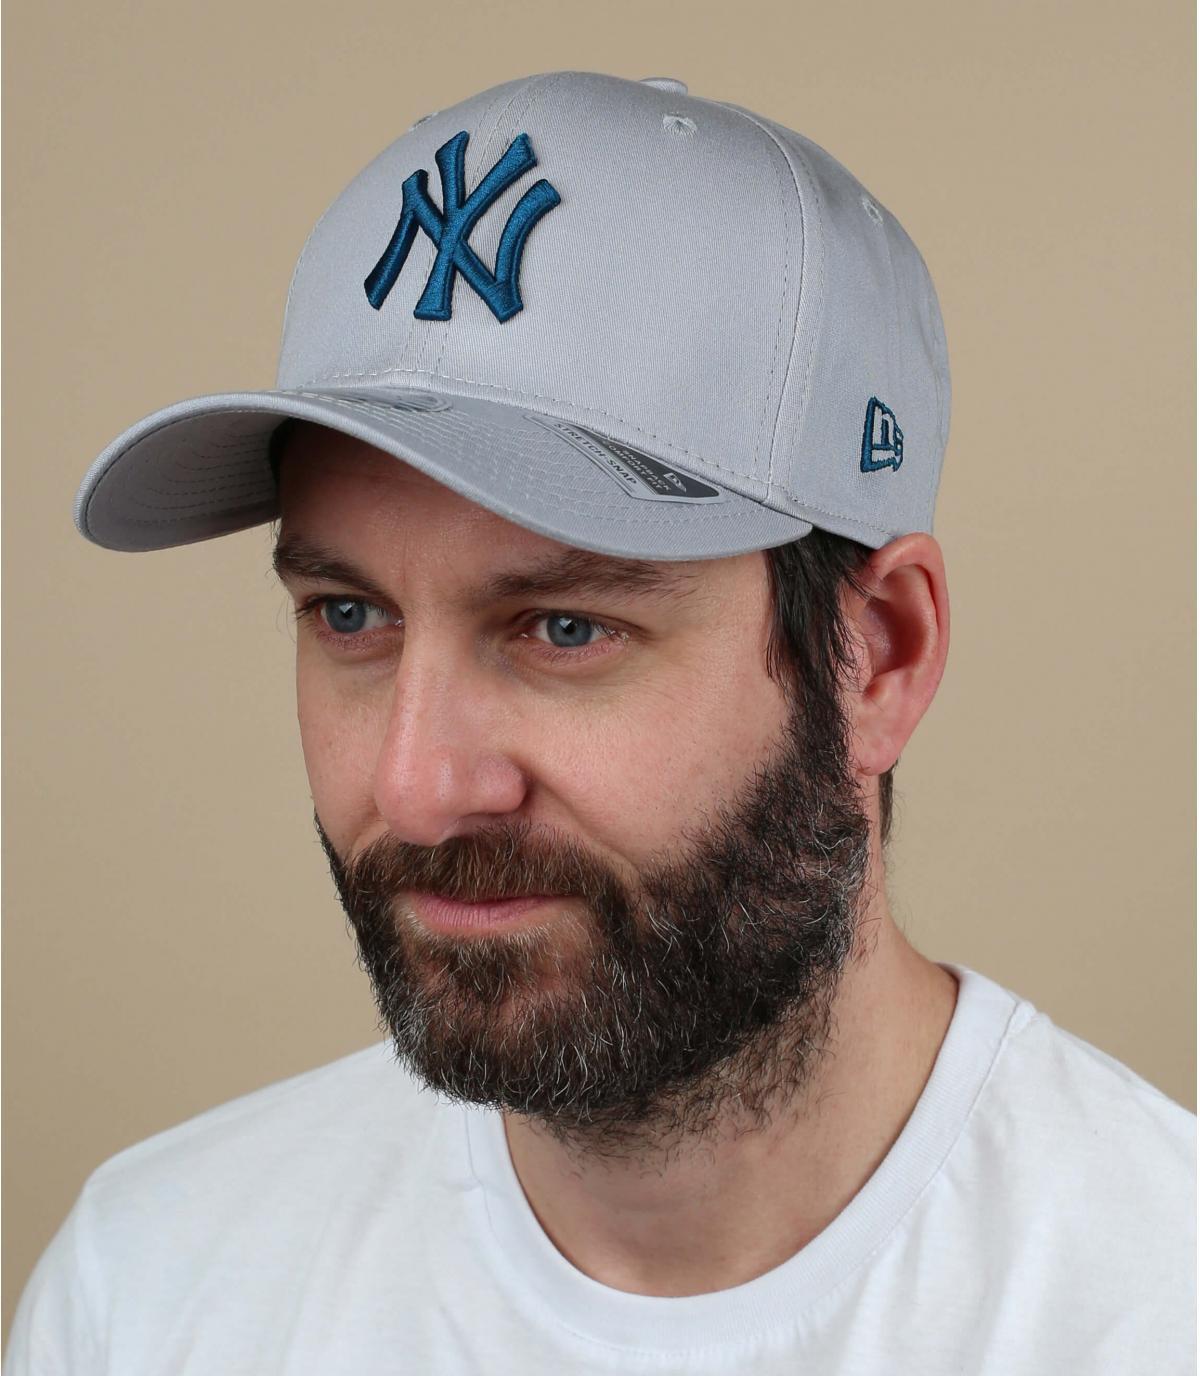 Cappellino grigio blu NY